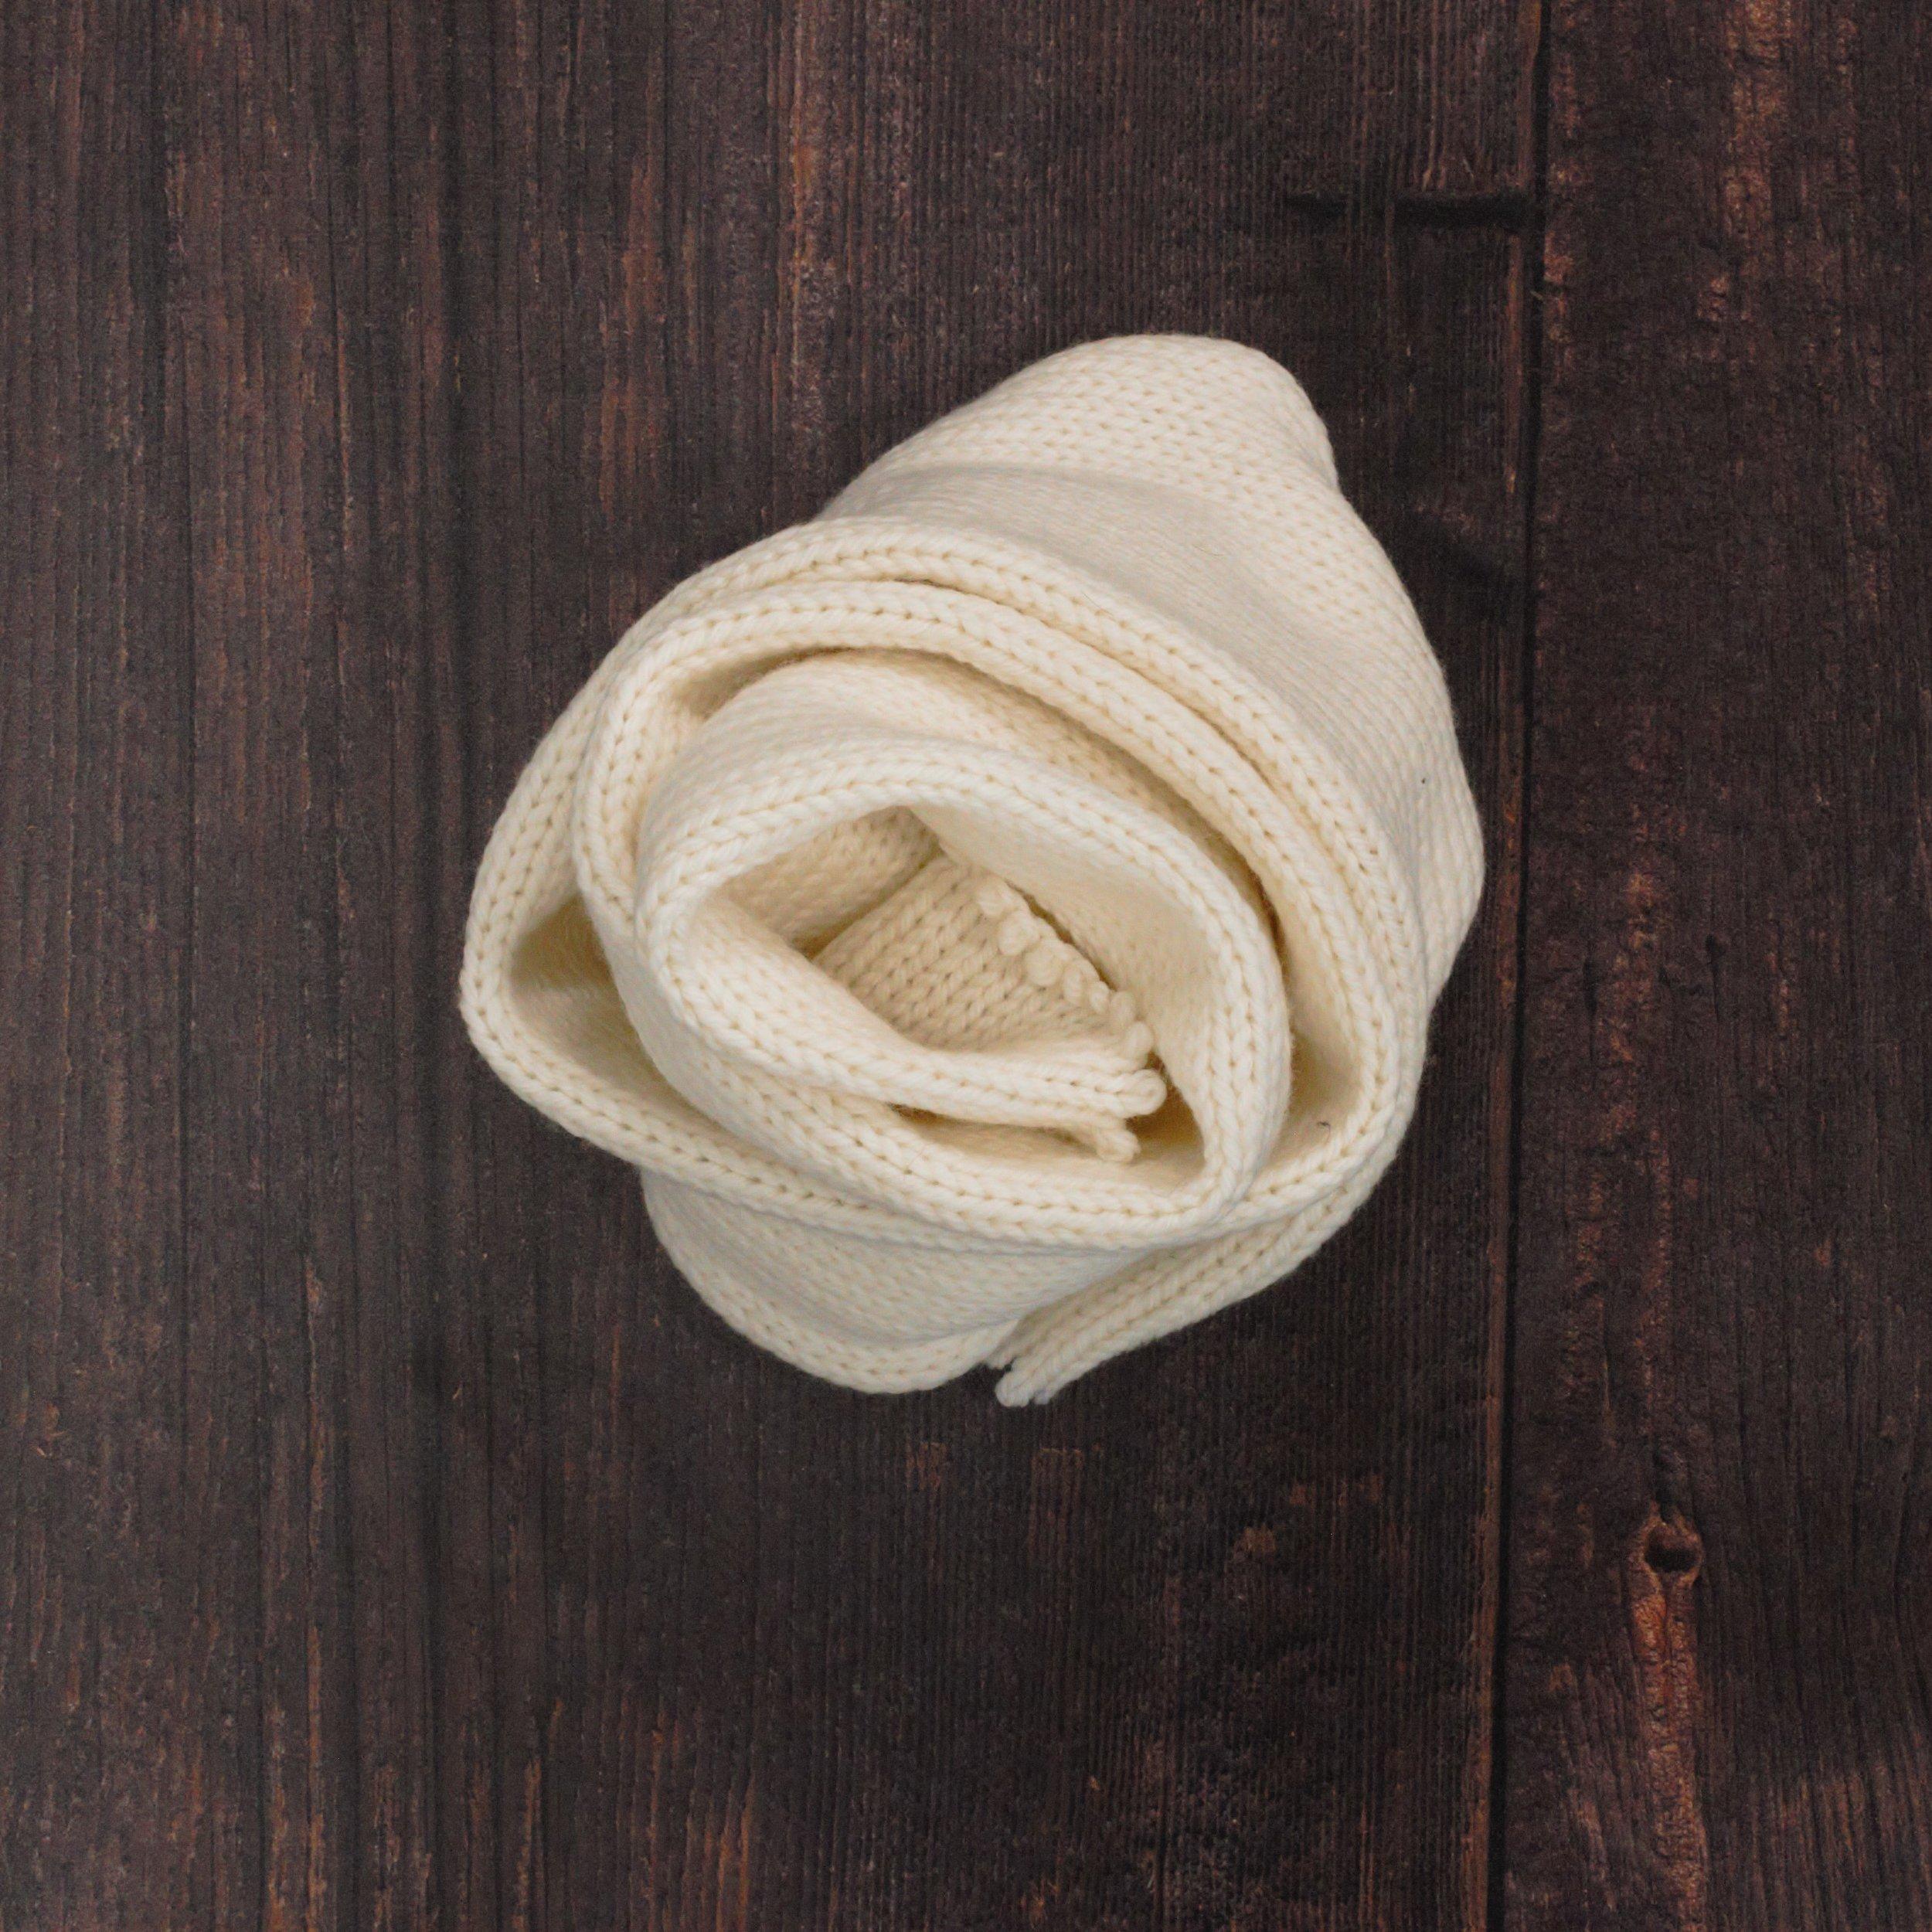 Type 49235  Ultra DK Sock Blank 100% Superwash Merino Wool    100g Sock Blank 225m per 100g 4/9nm